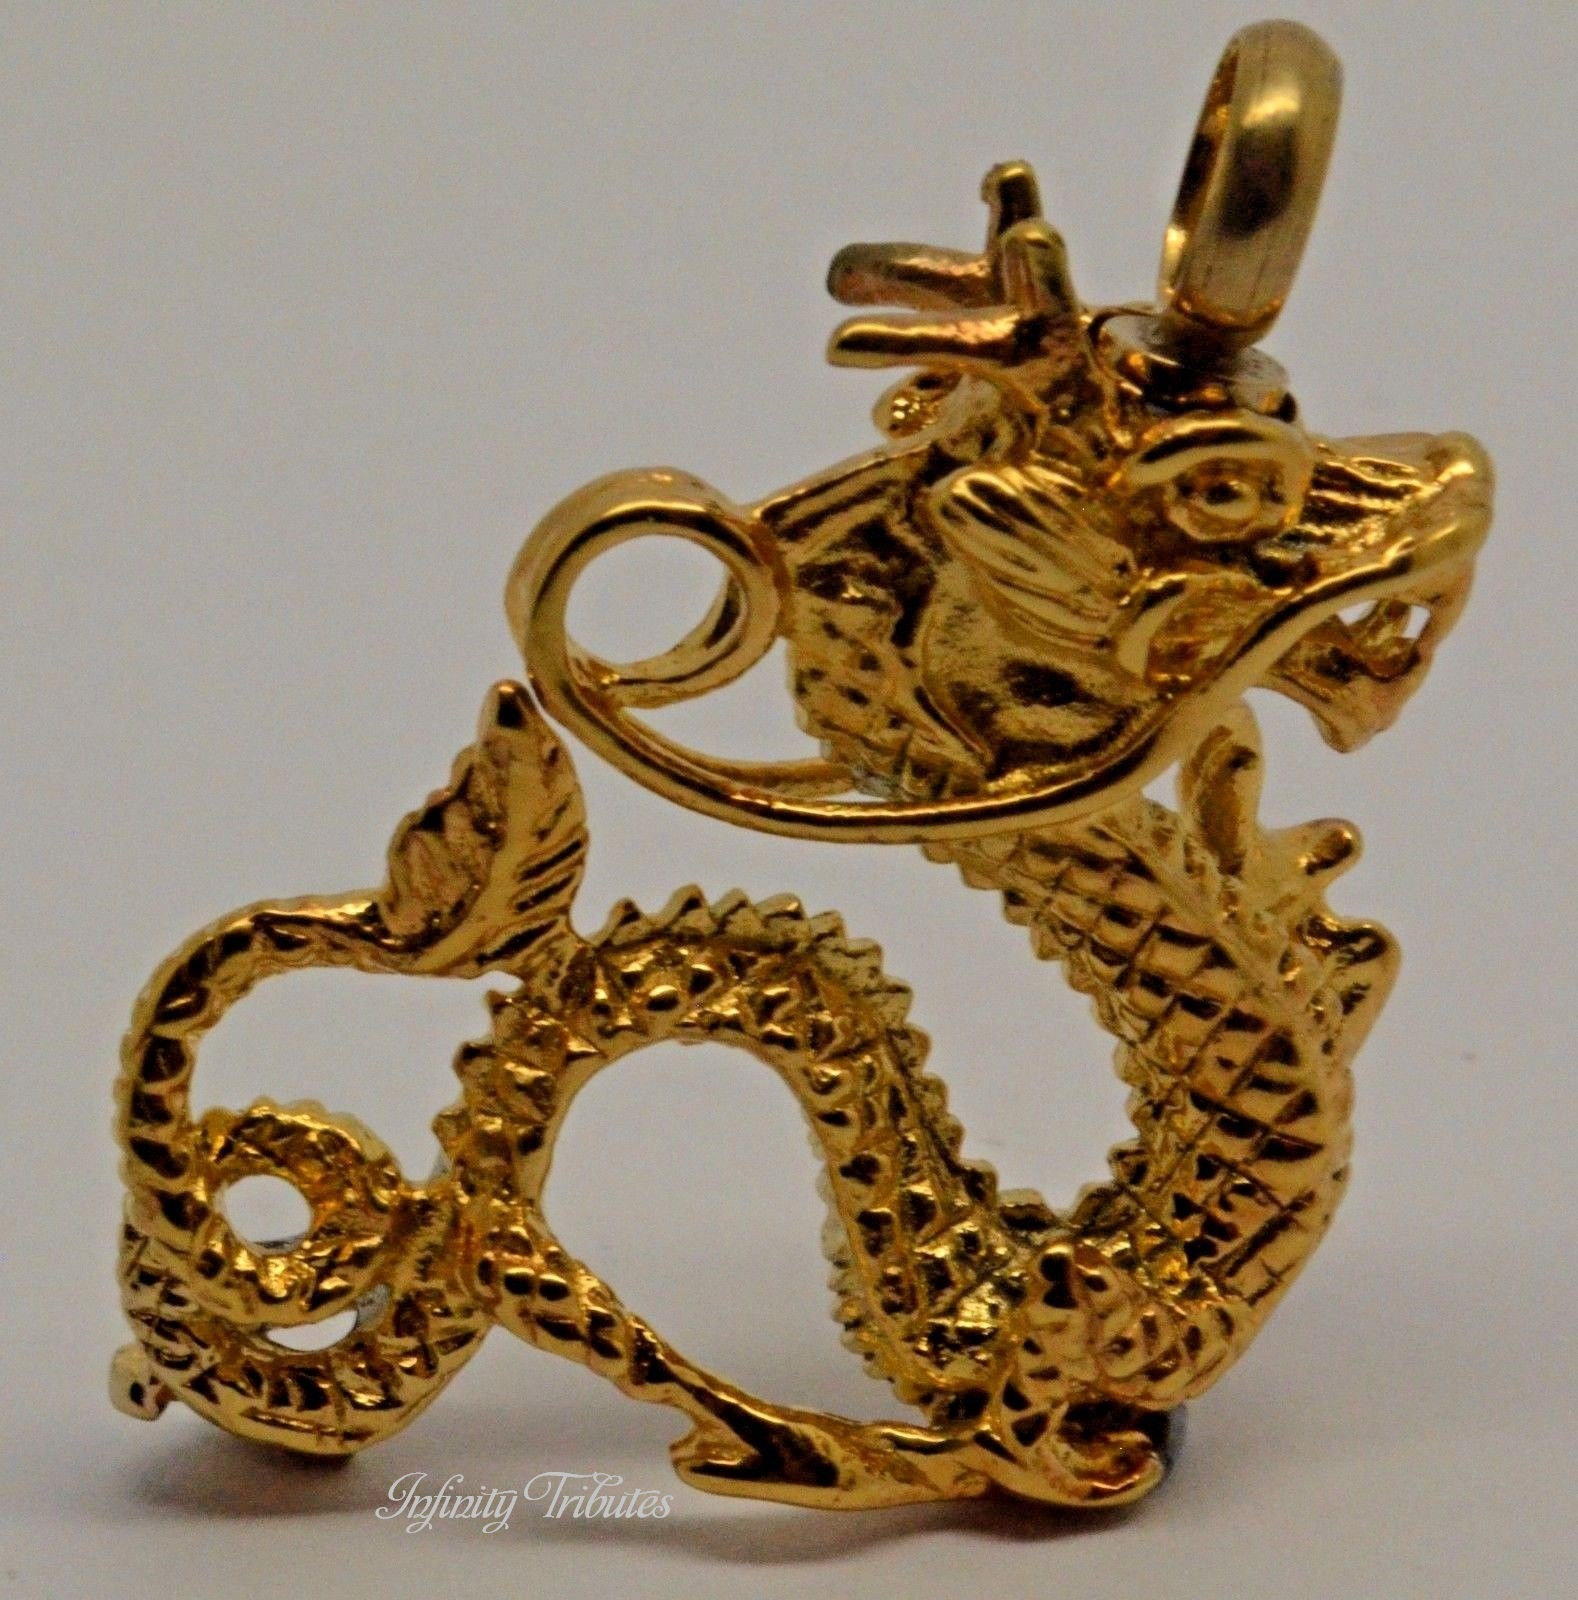 24k GOLD PLATED DRAGON CREMATION URN KEEPSAKE PENDANT NECKLACE ASH CHARM